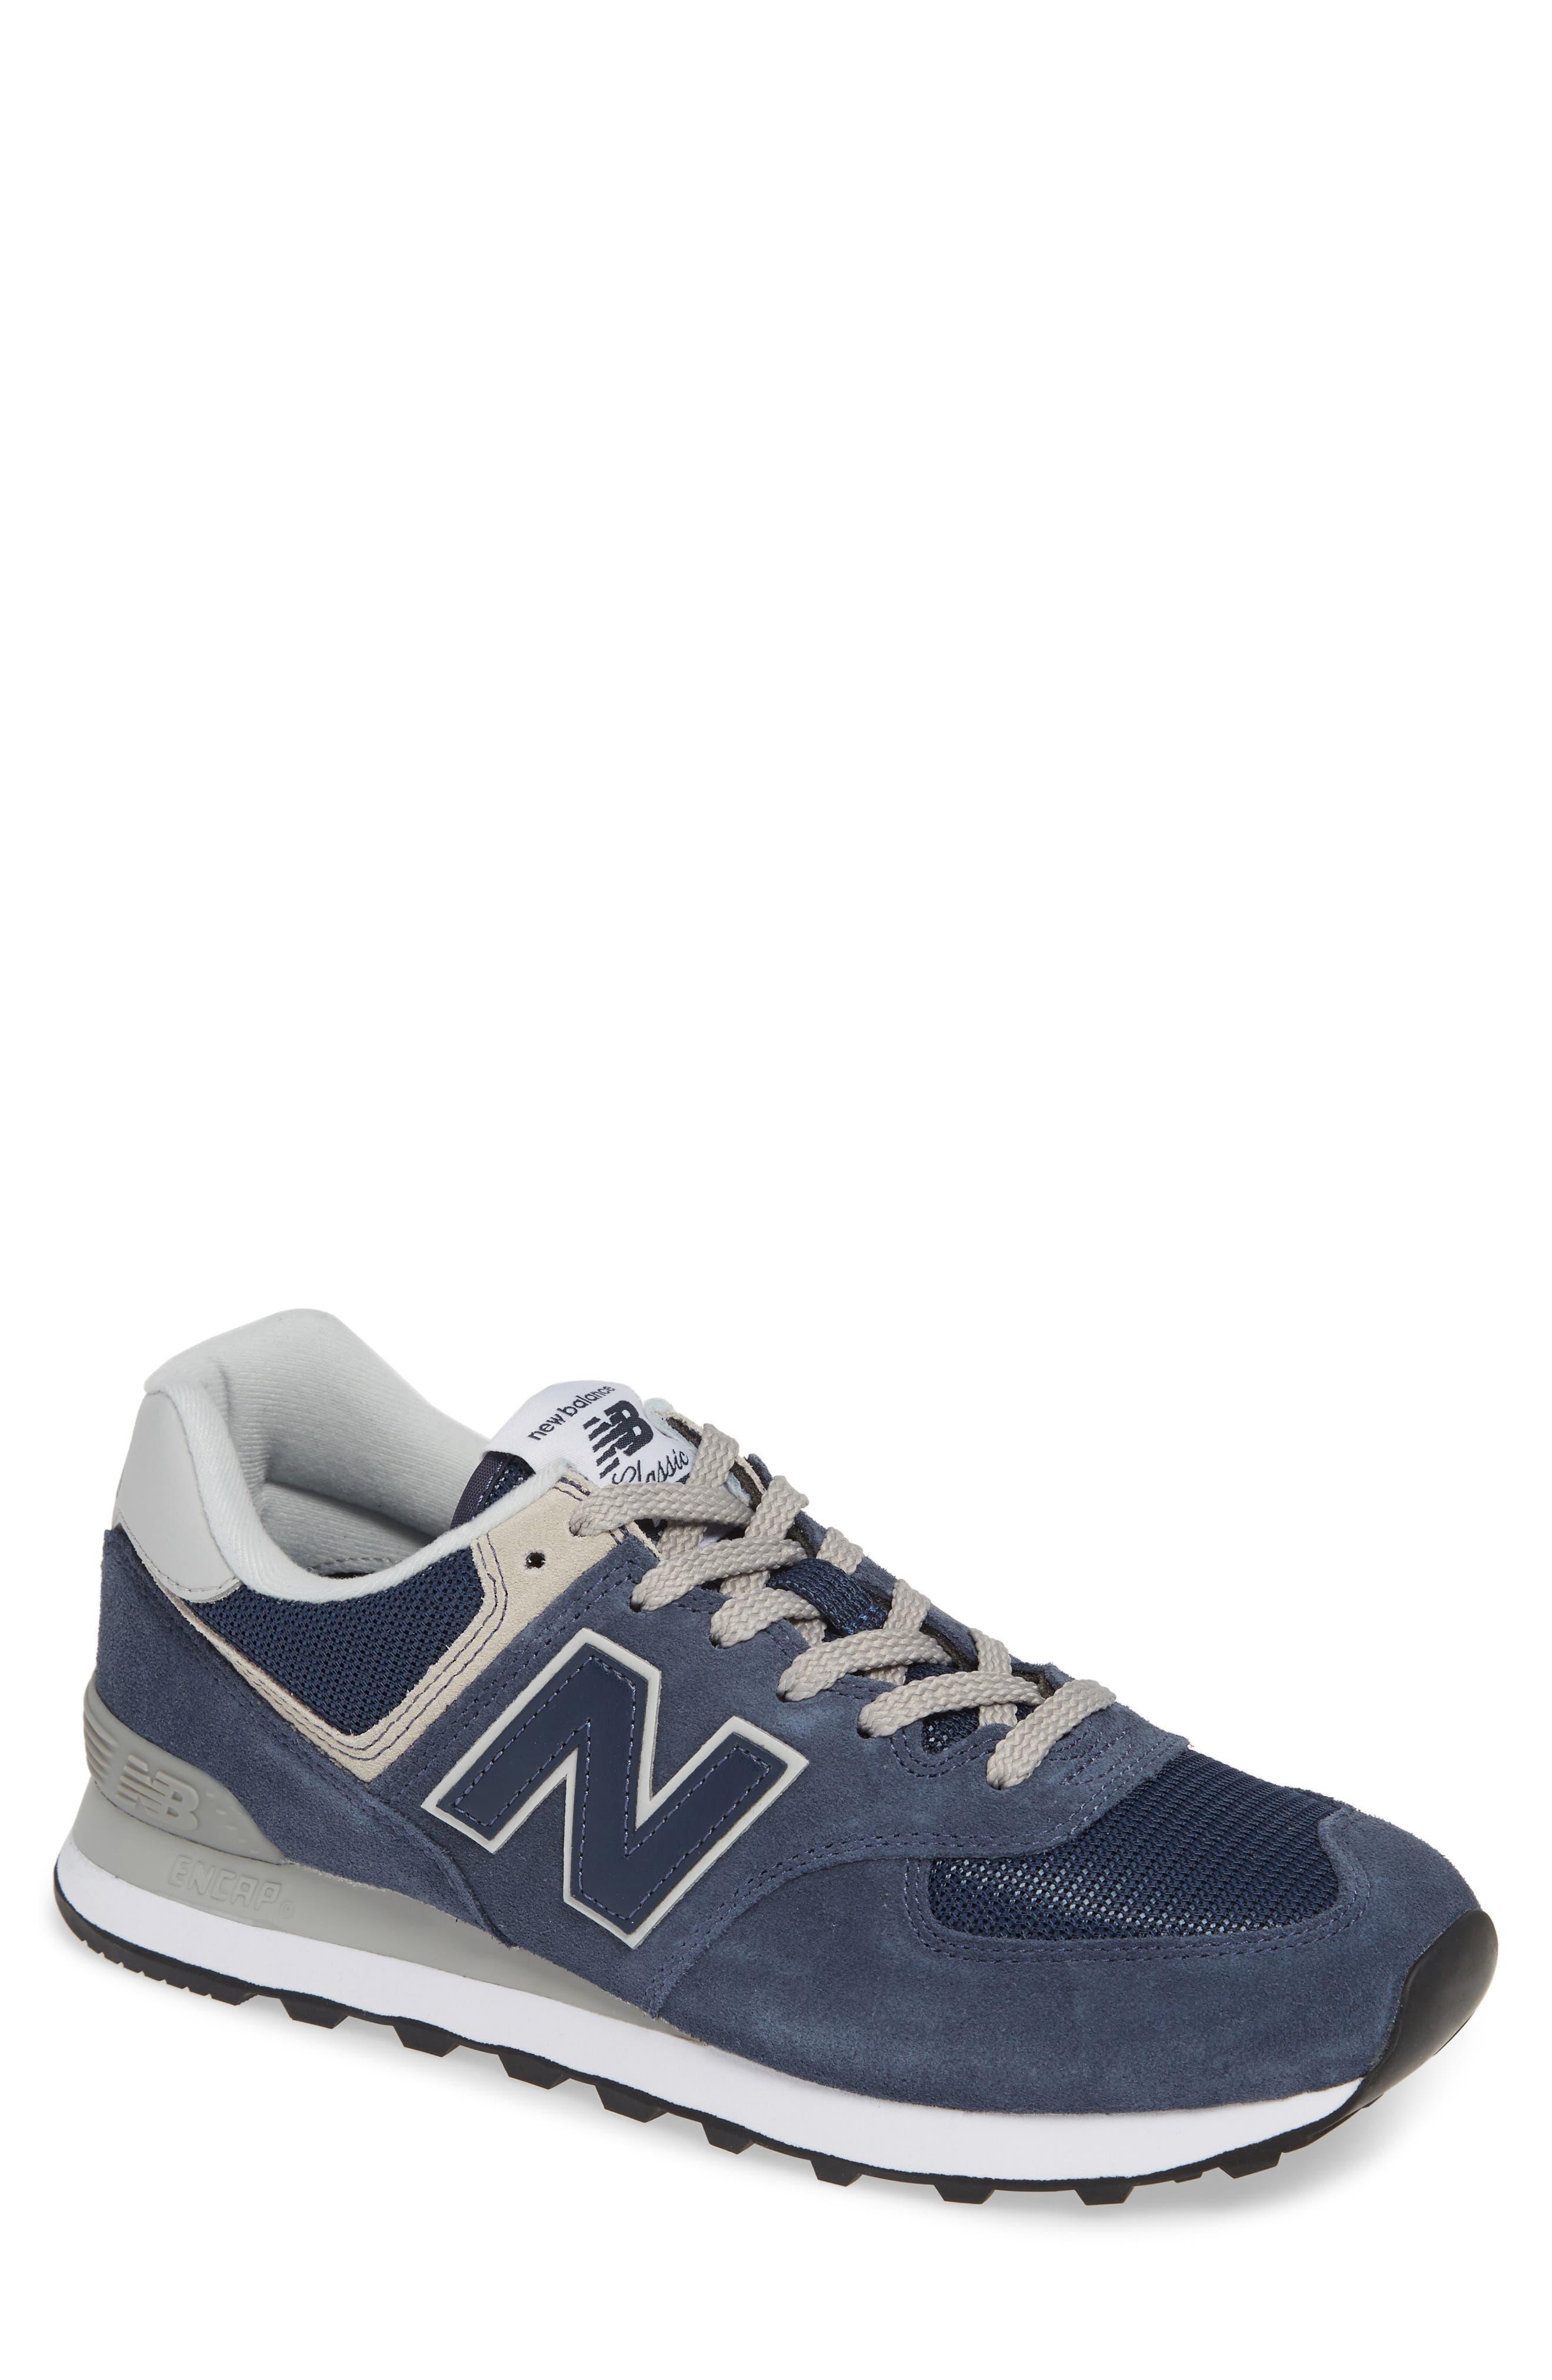 2993d06e4d4 New Balance Sneakers